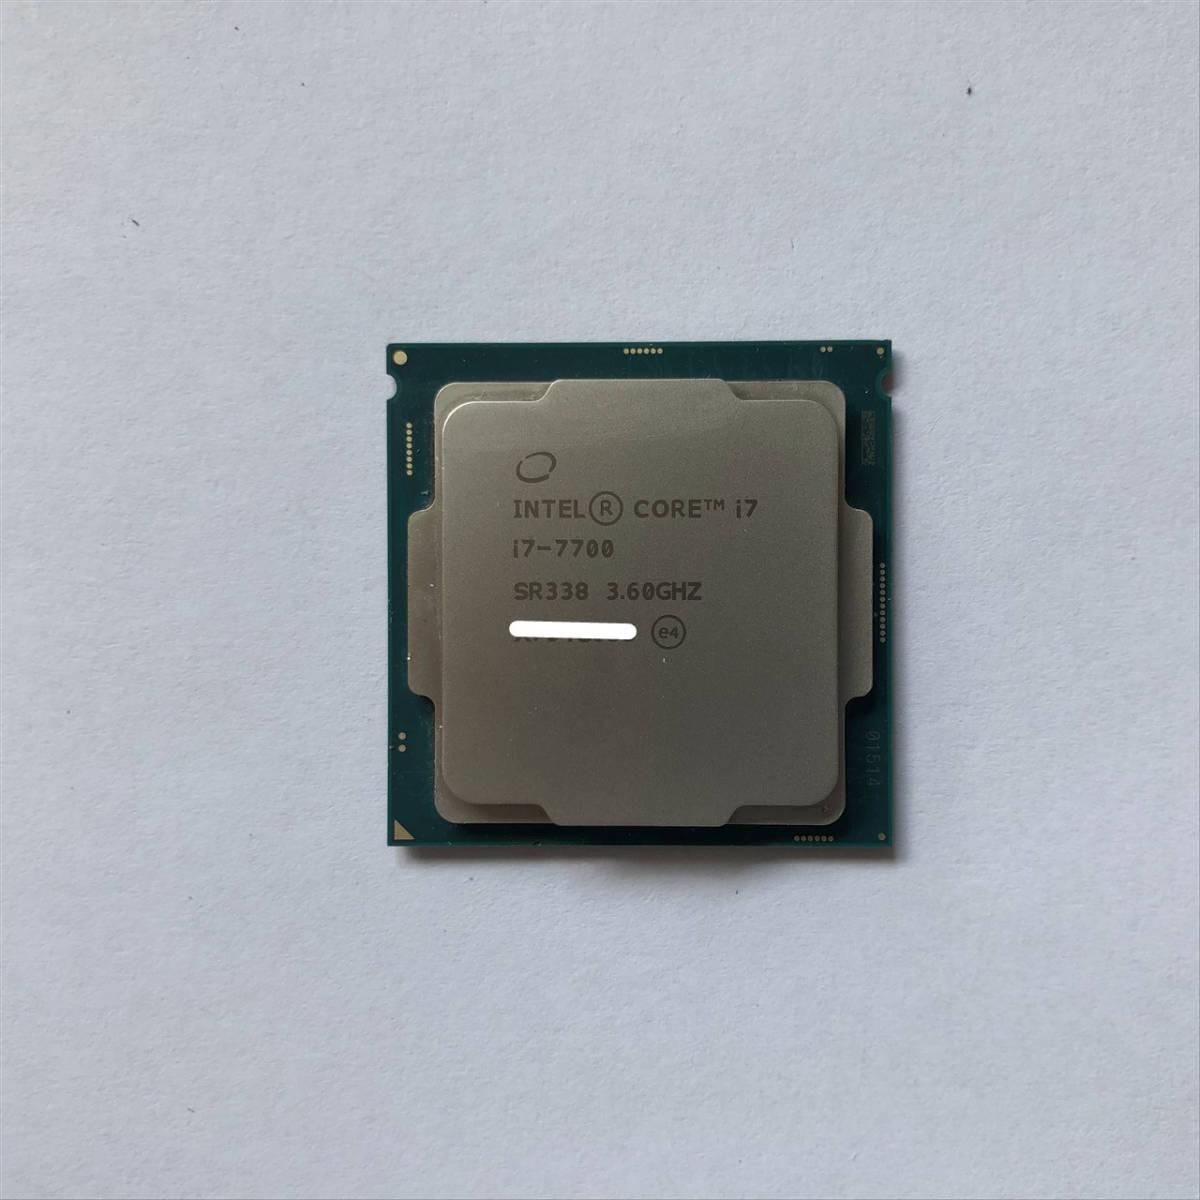 Intel Core i7-7700 SR338 3.60GHZ